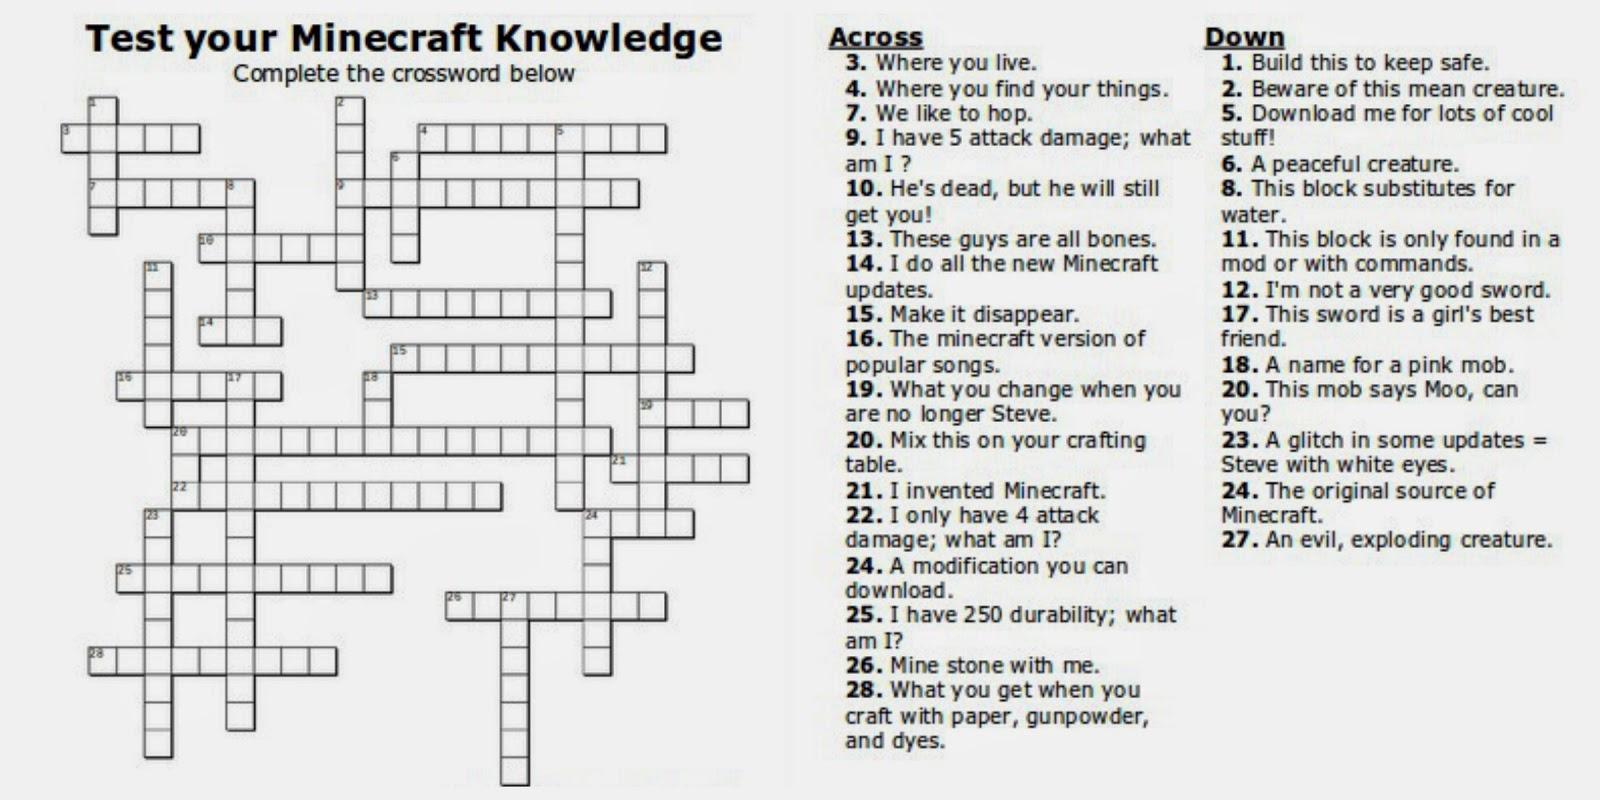 Free Printable Minecraft Crossword Search: Test Your Minecraft - Printable Crossword Search